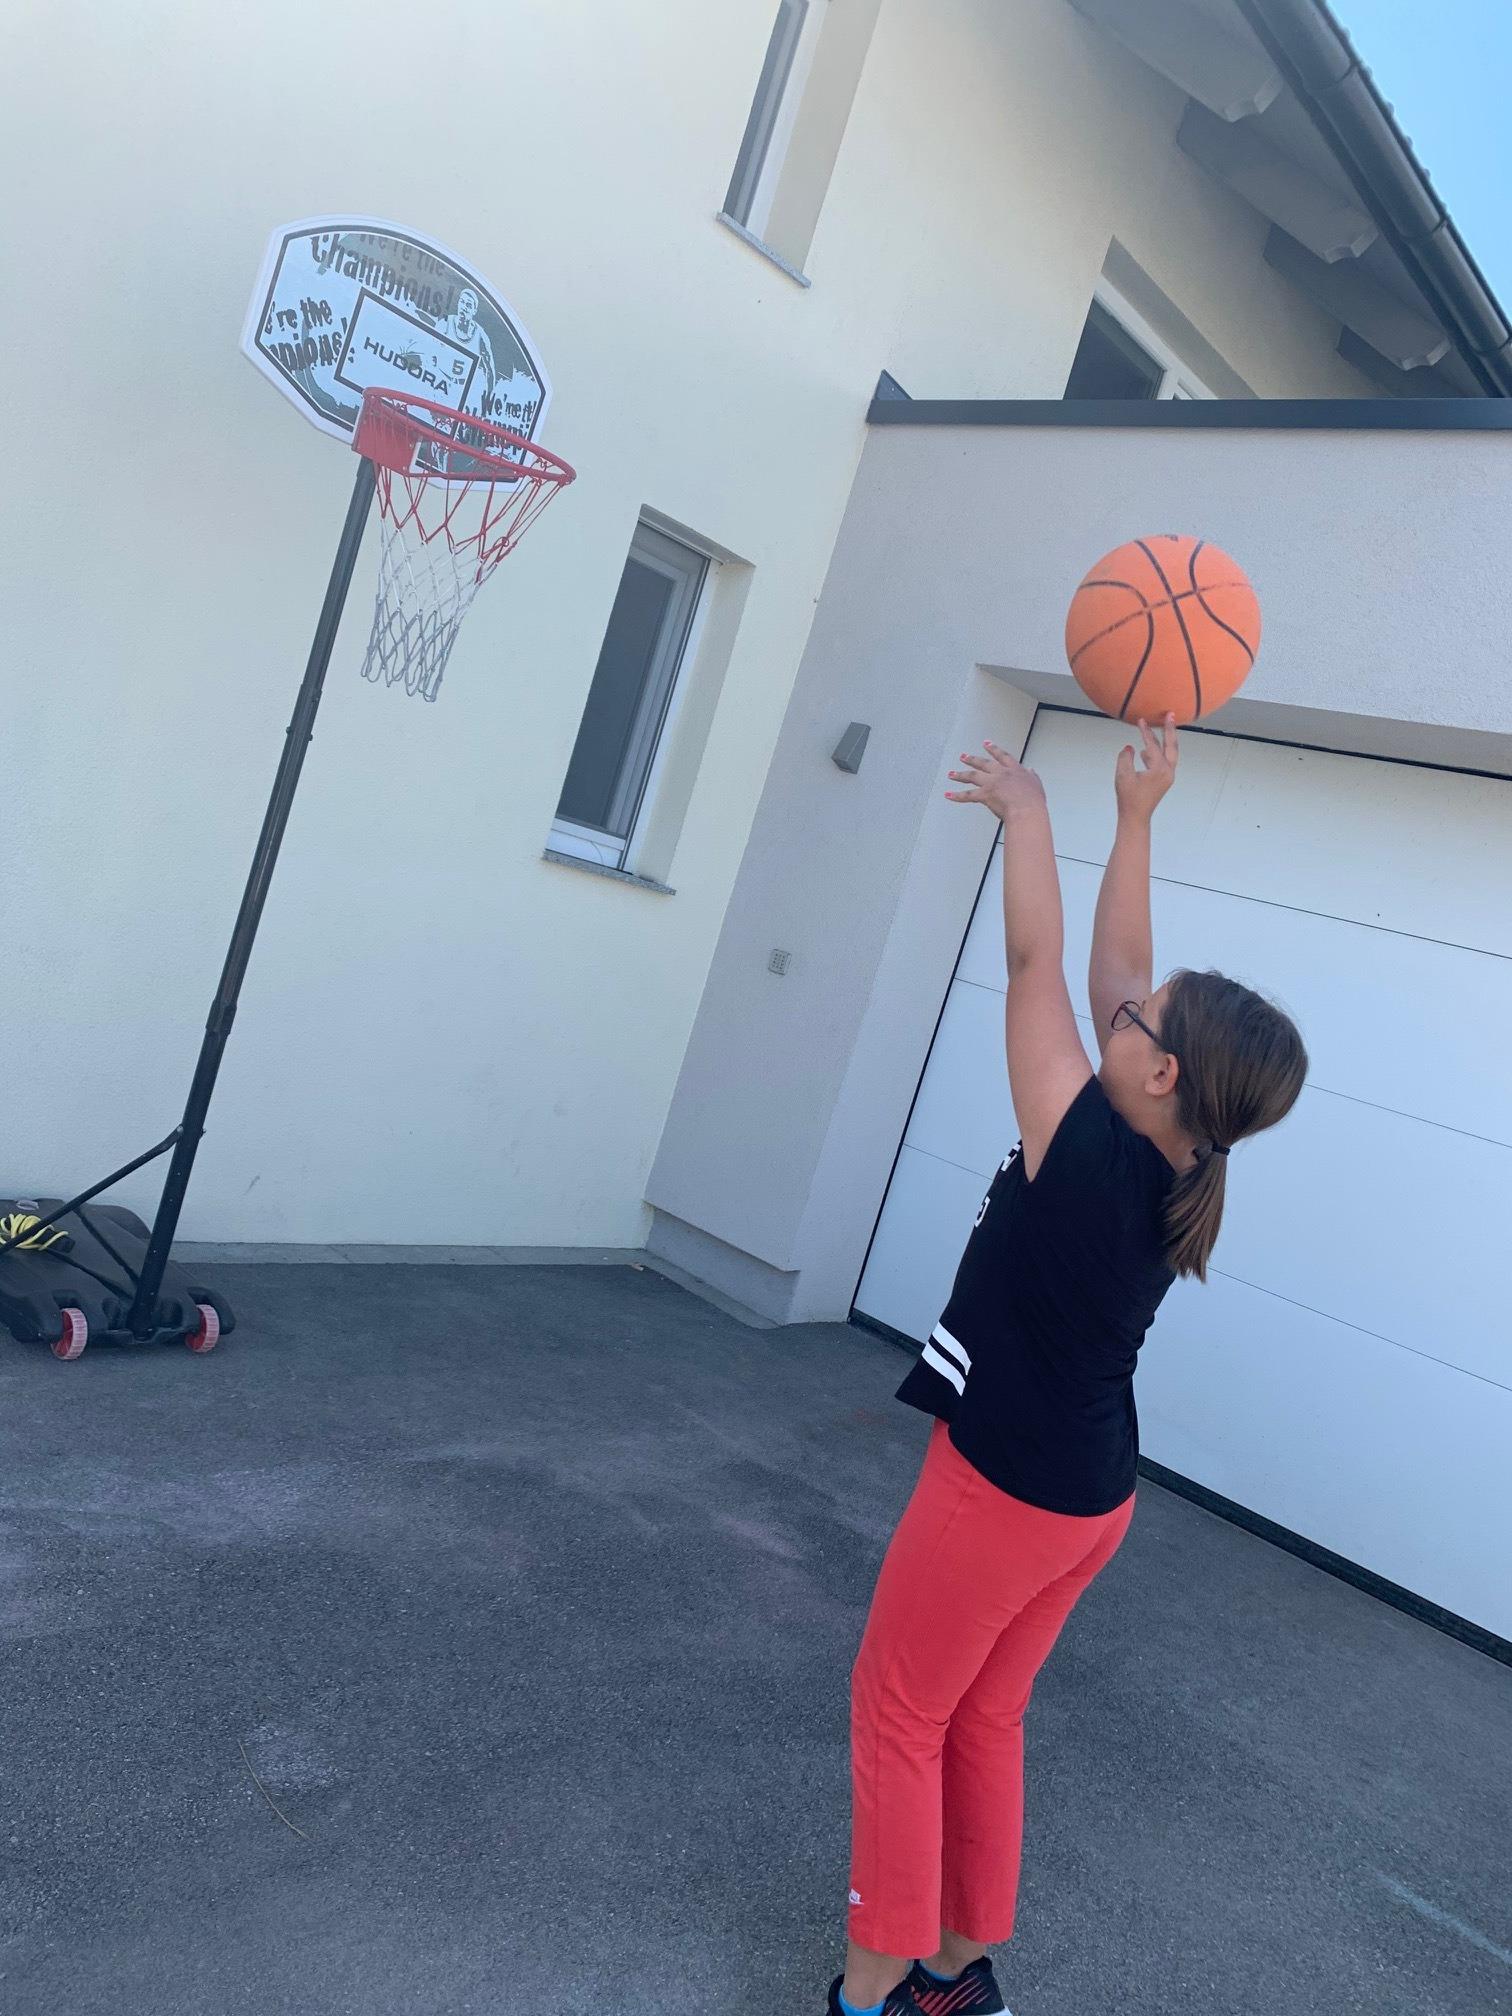 Basketball_3a_1_edited.jpg